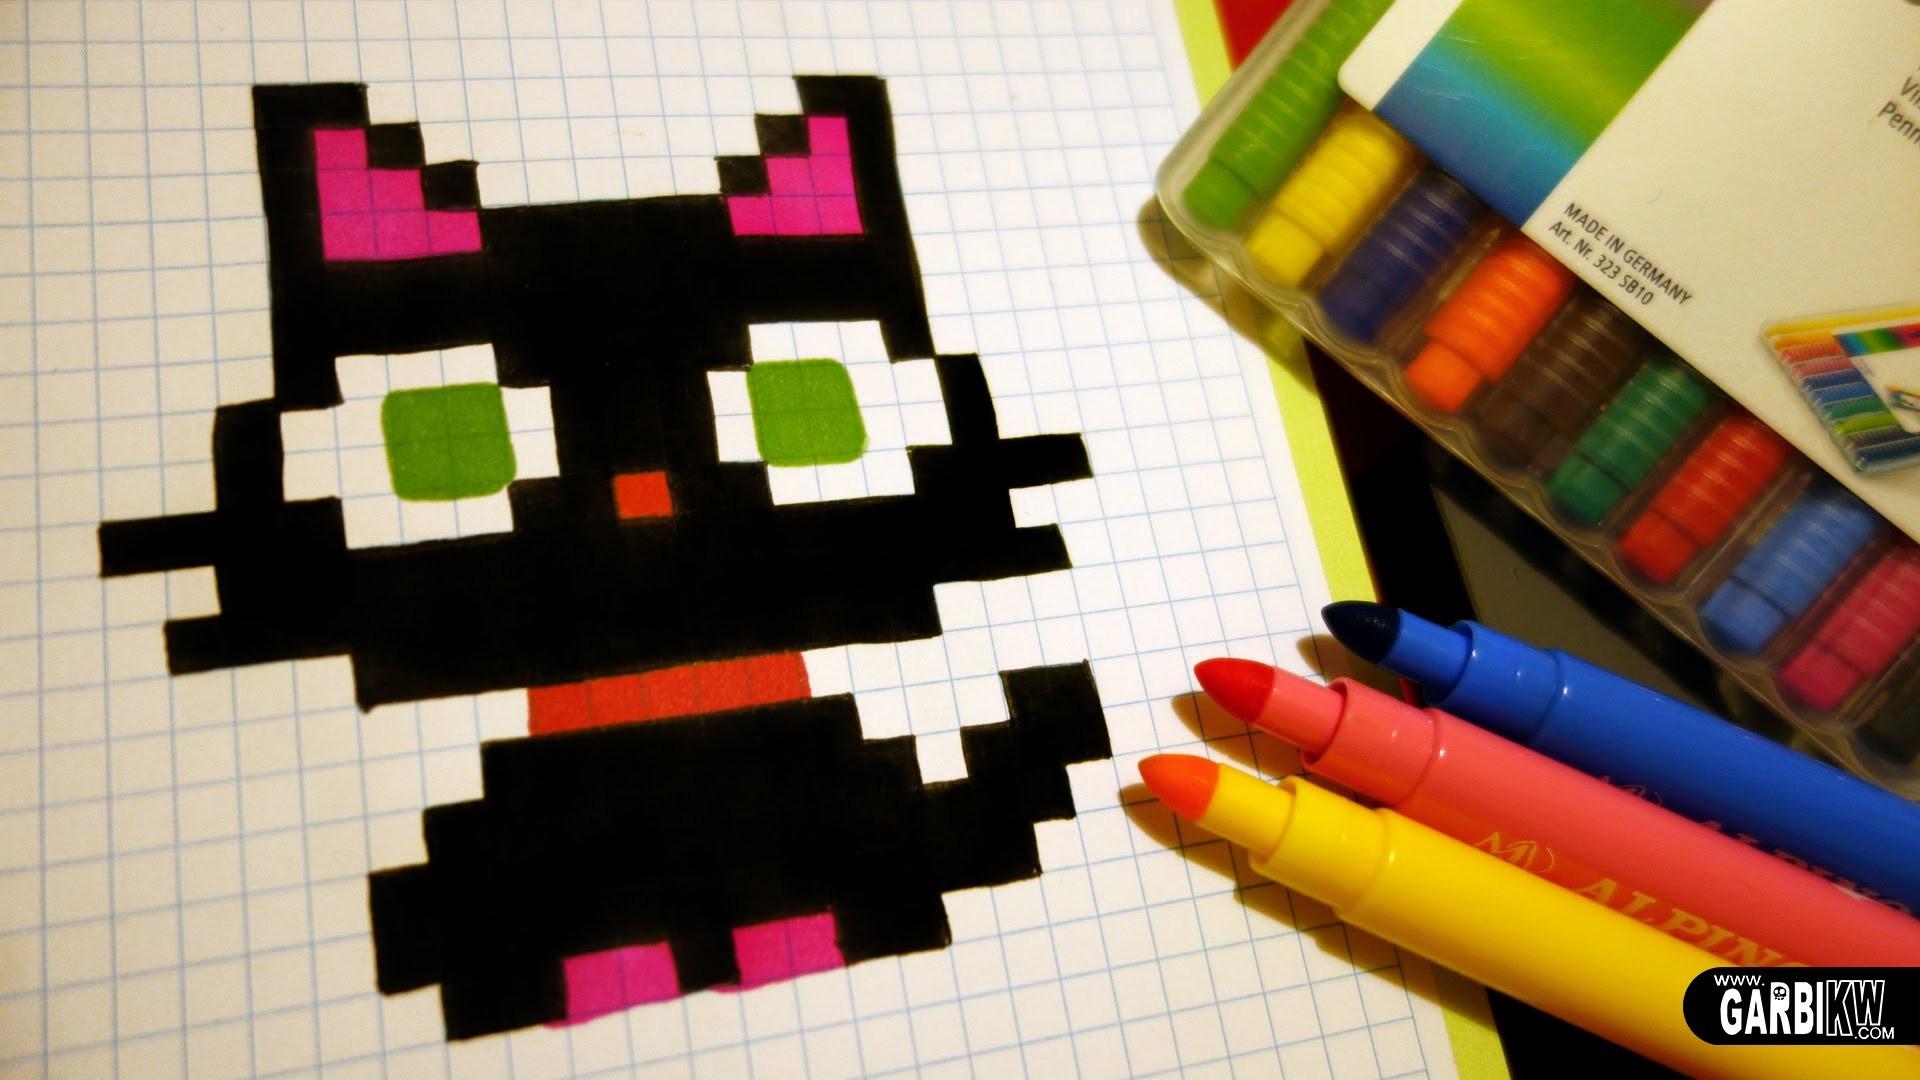 Handmade Pixel Art - How To Draw a Kawaii Black Kitty #pixelart